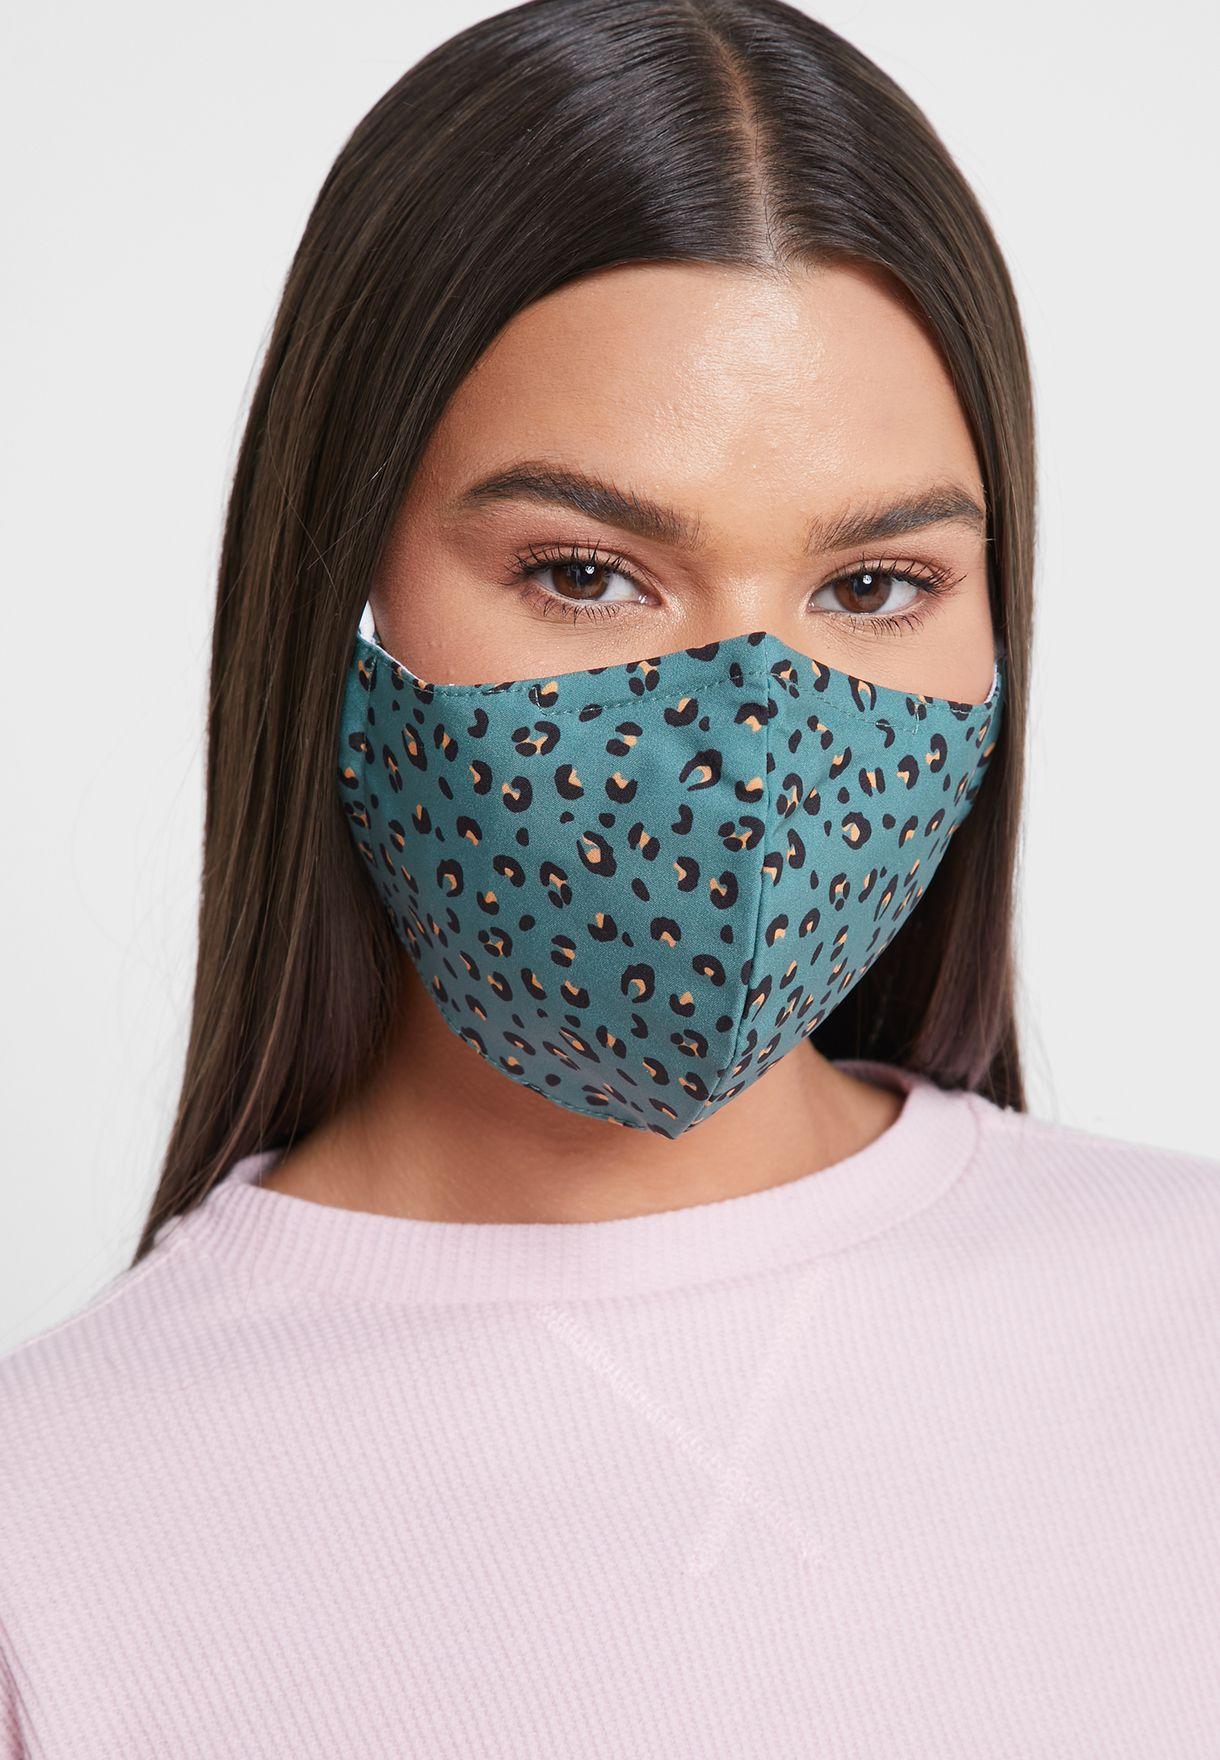 Khaki Leopard Face Covering Mask